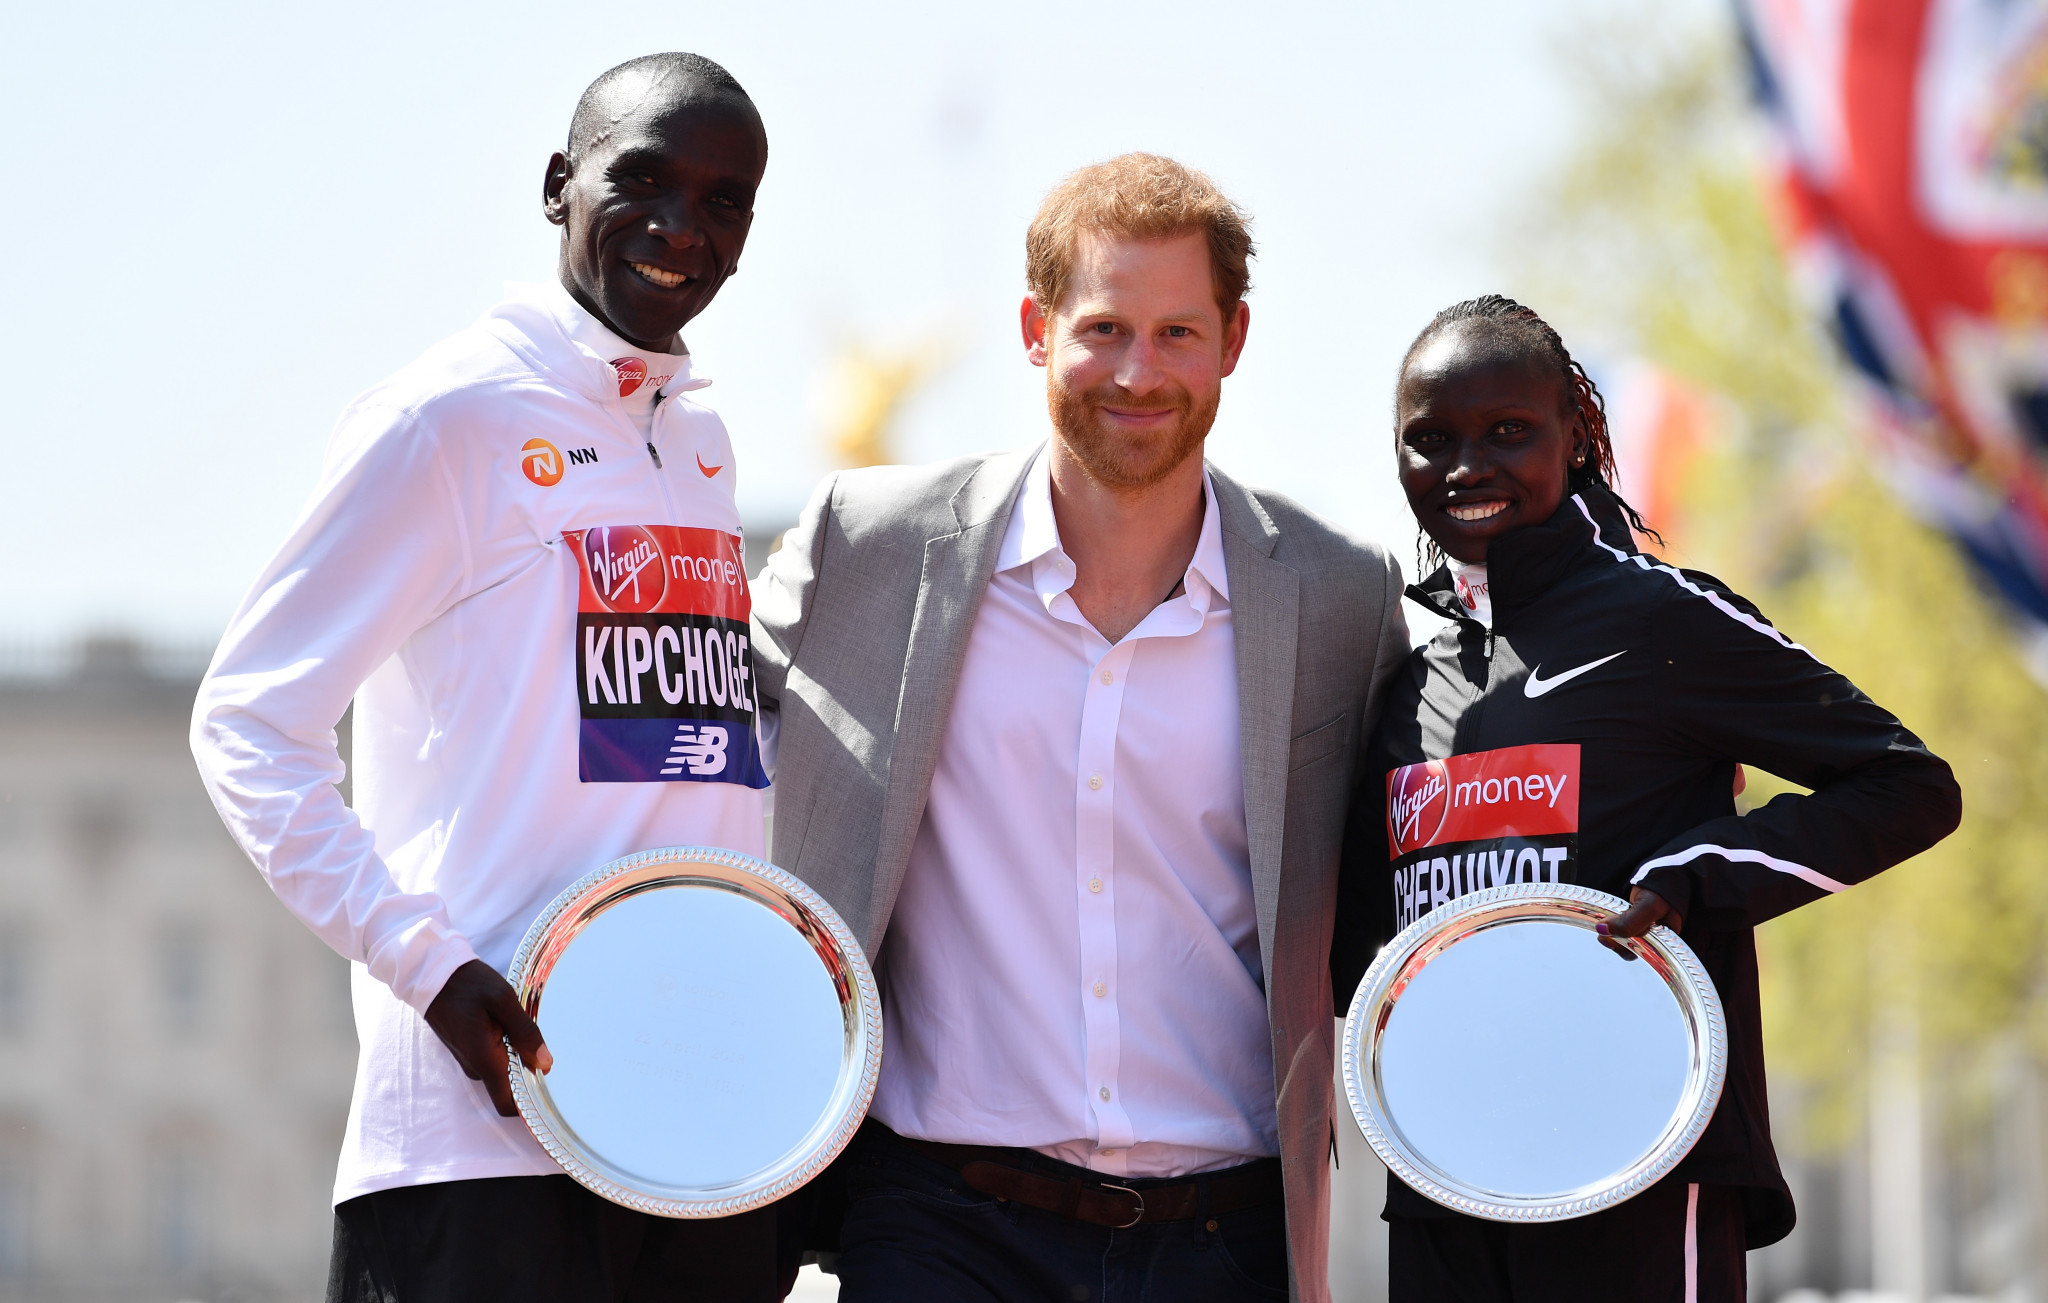 Kipchoge dominates as Cheruiyot upsets favourites at Virgin London Marathon